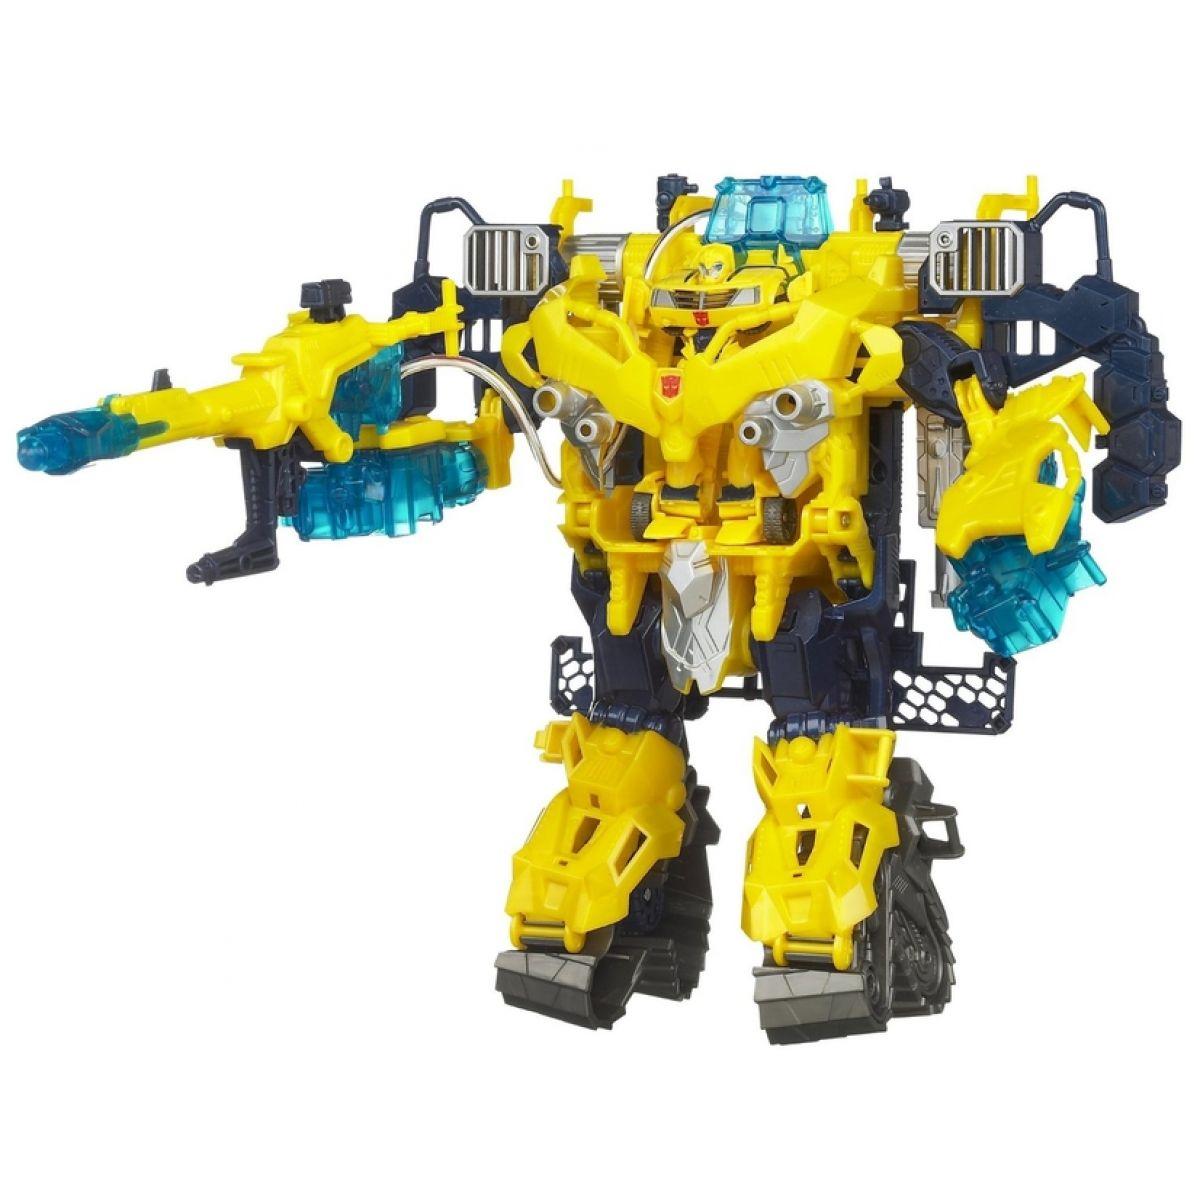 Transformers Prime Cyberverse Hasbro 38003 - Bumblebee Battle Suit